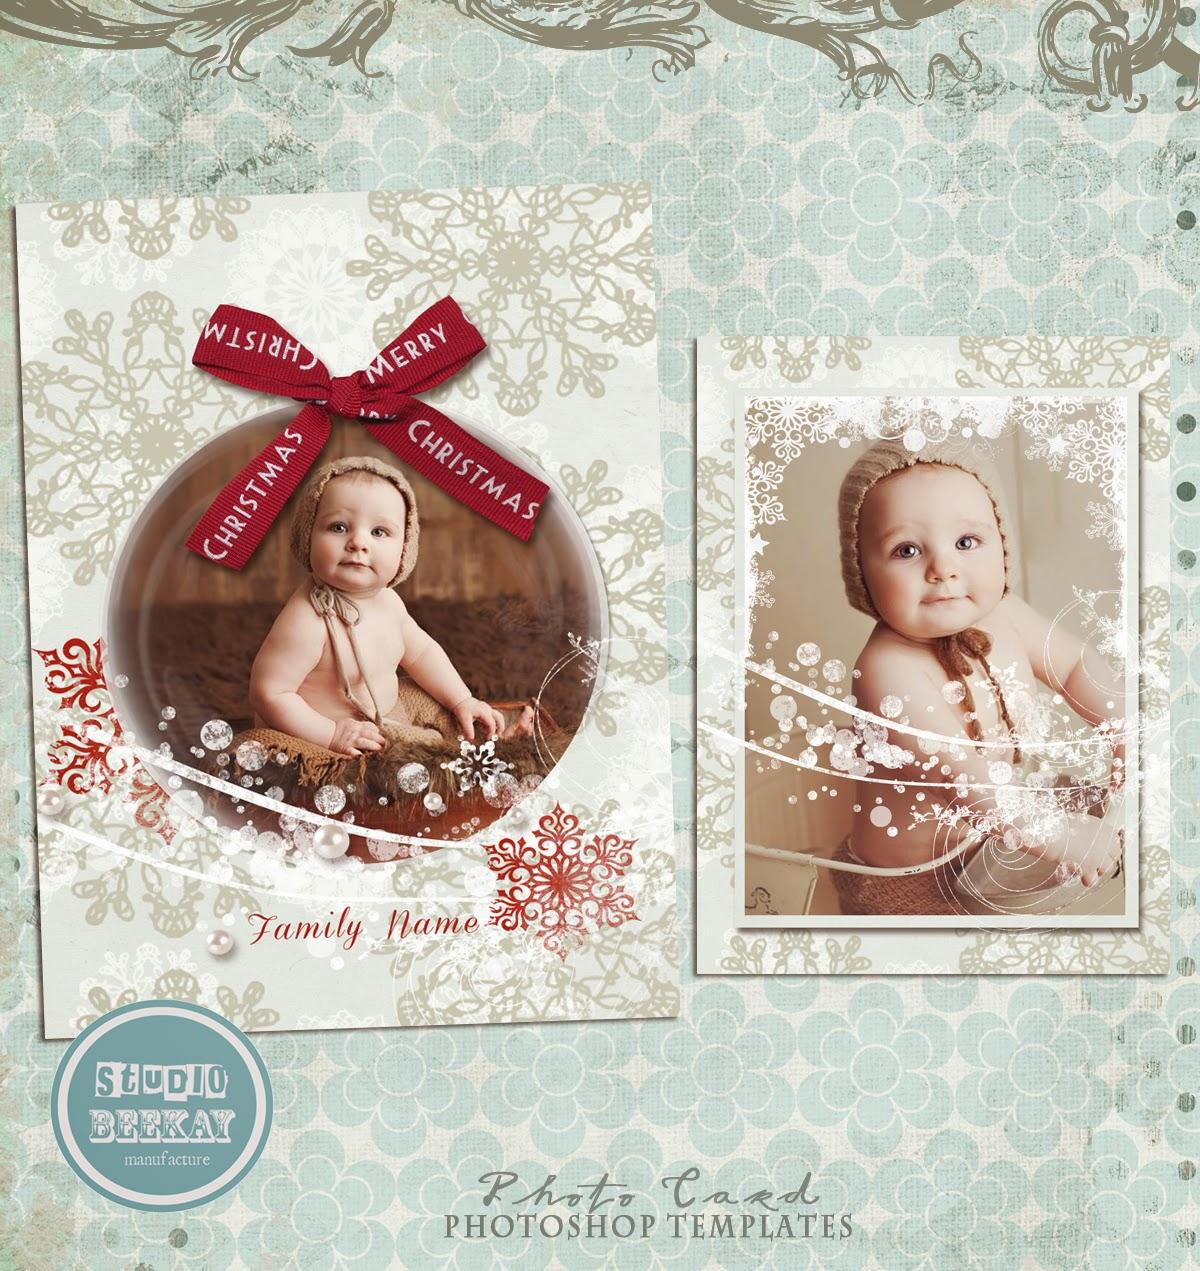 Poshop Templates For Pographers | Photoshop Templates For Pro Photographers New Christmas Card